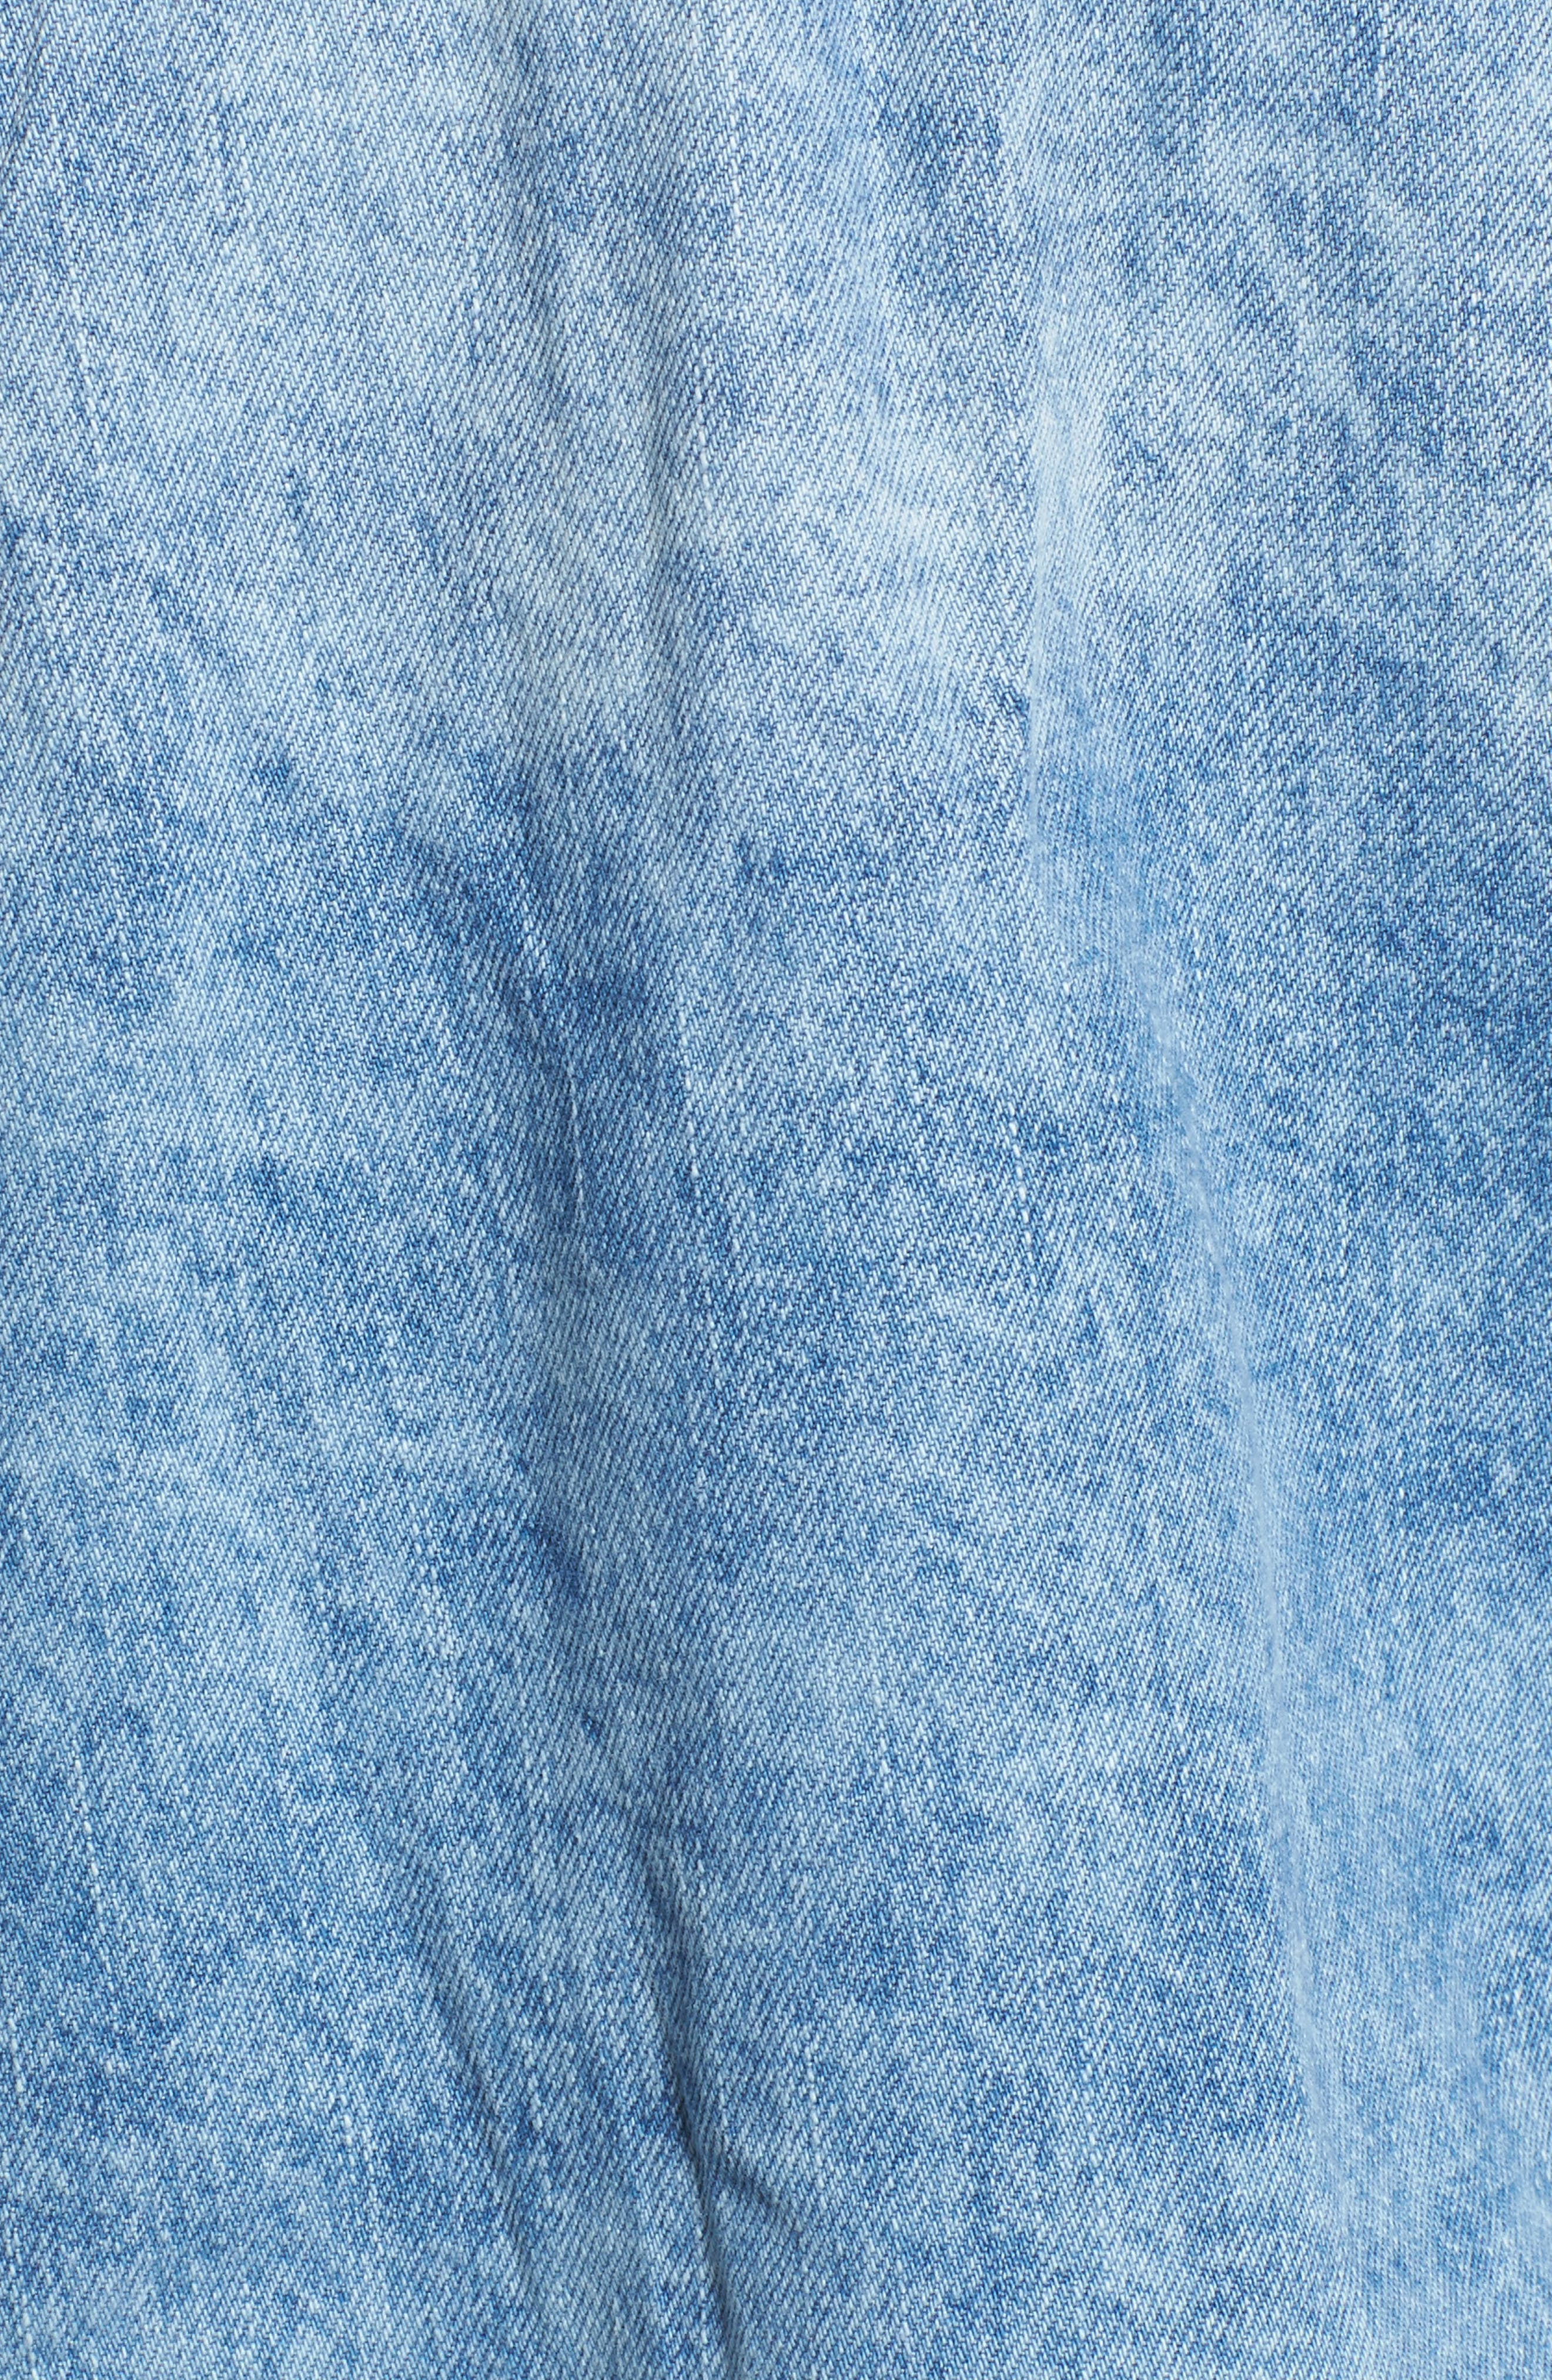 Alternate Image 5  - Tinsel Star & Stud Denim Jacket